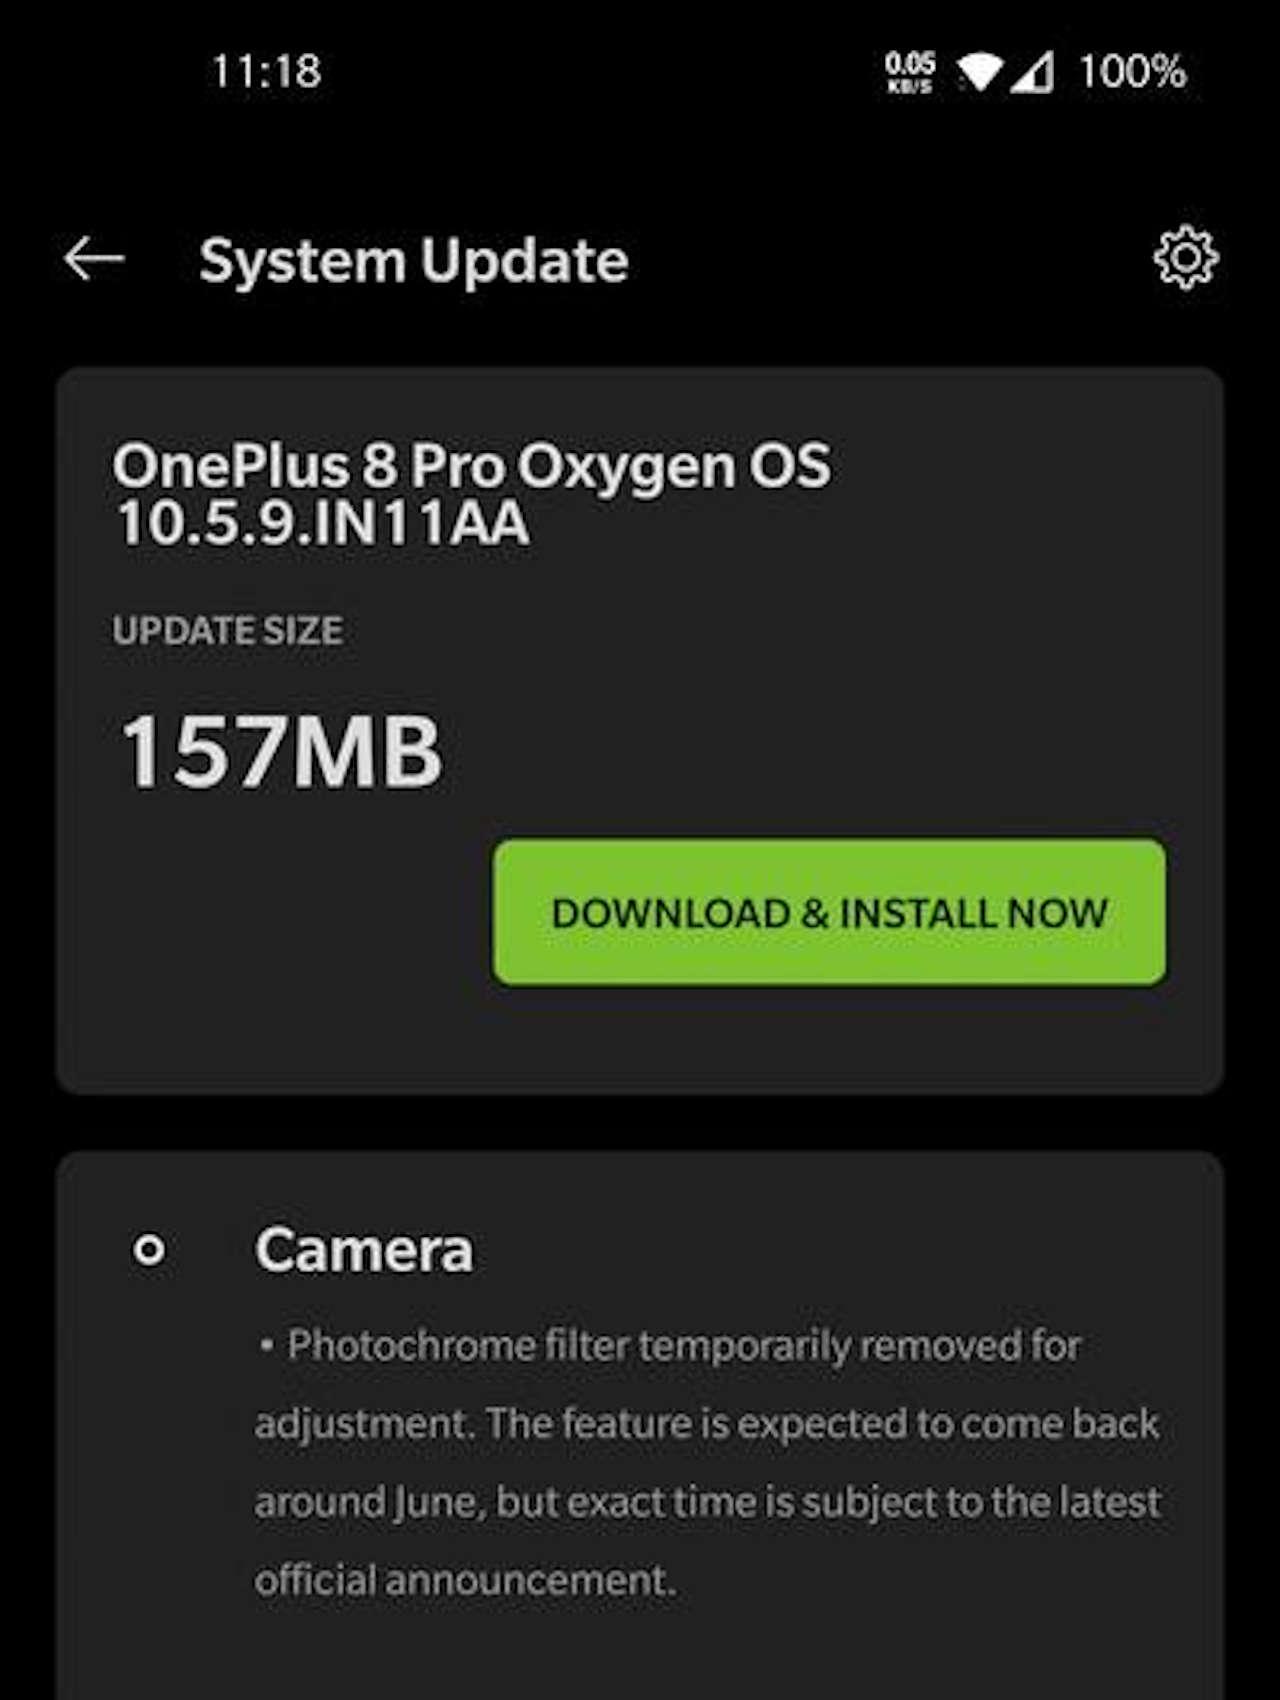 oneplus 8 pro oxygenos 10.5.9